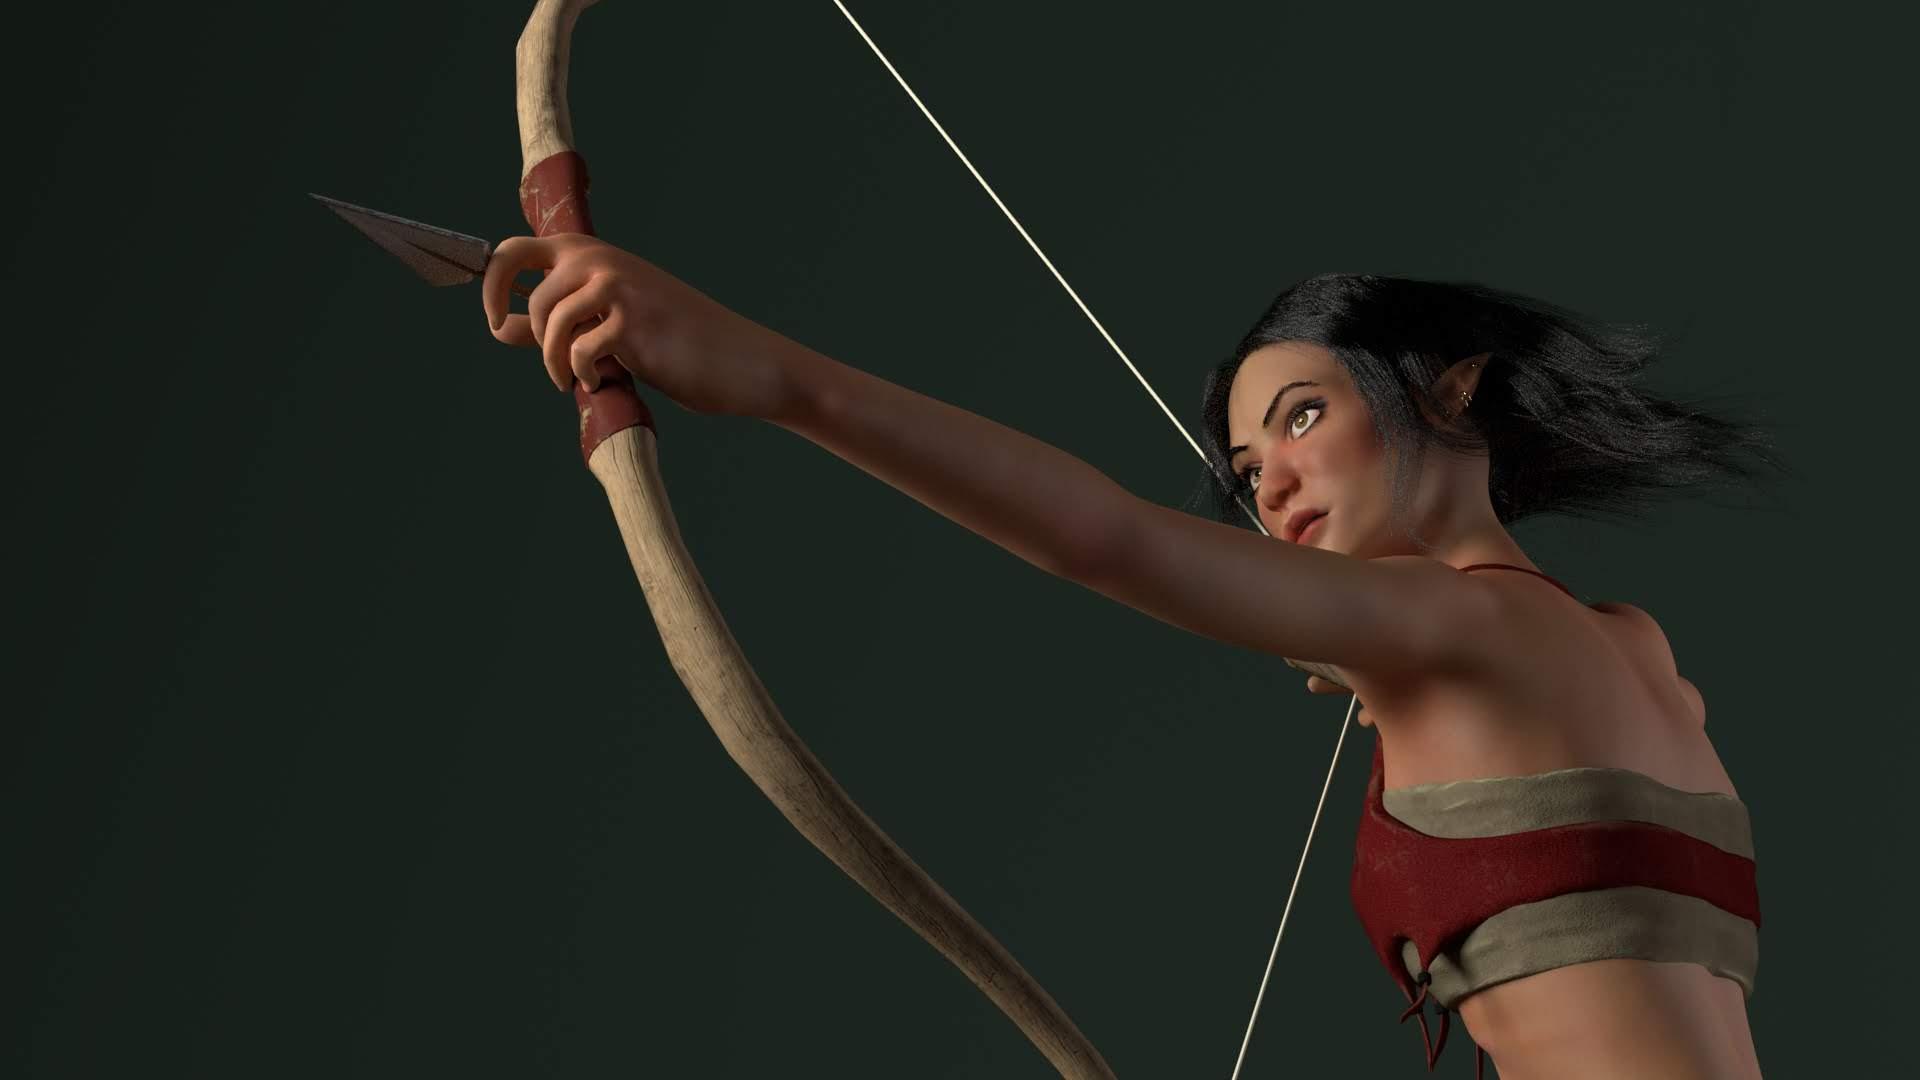 A design of a character shooting an arrow.